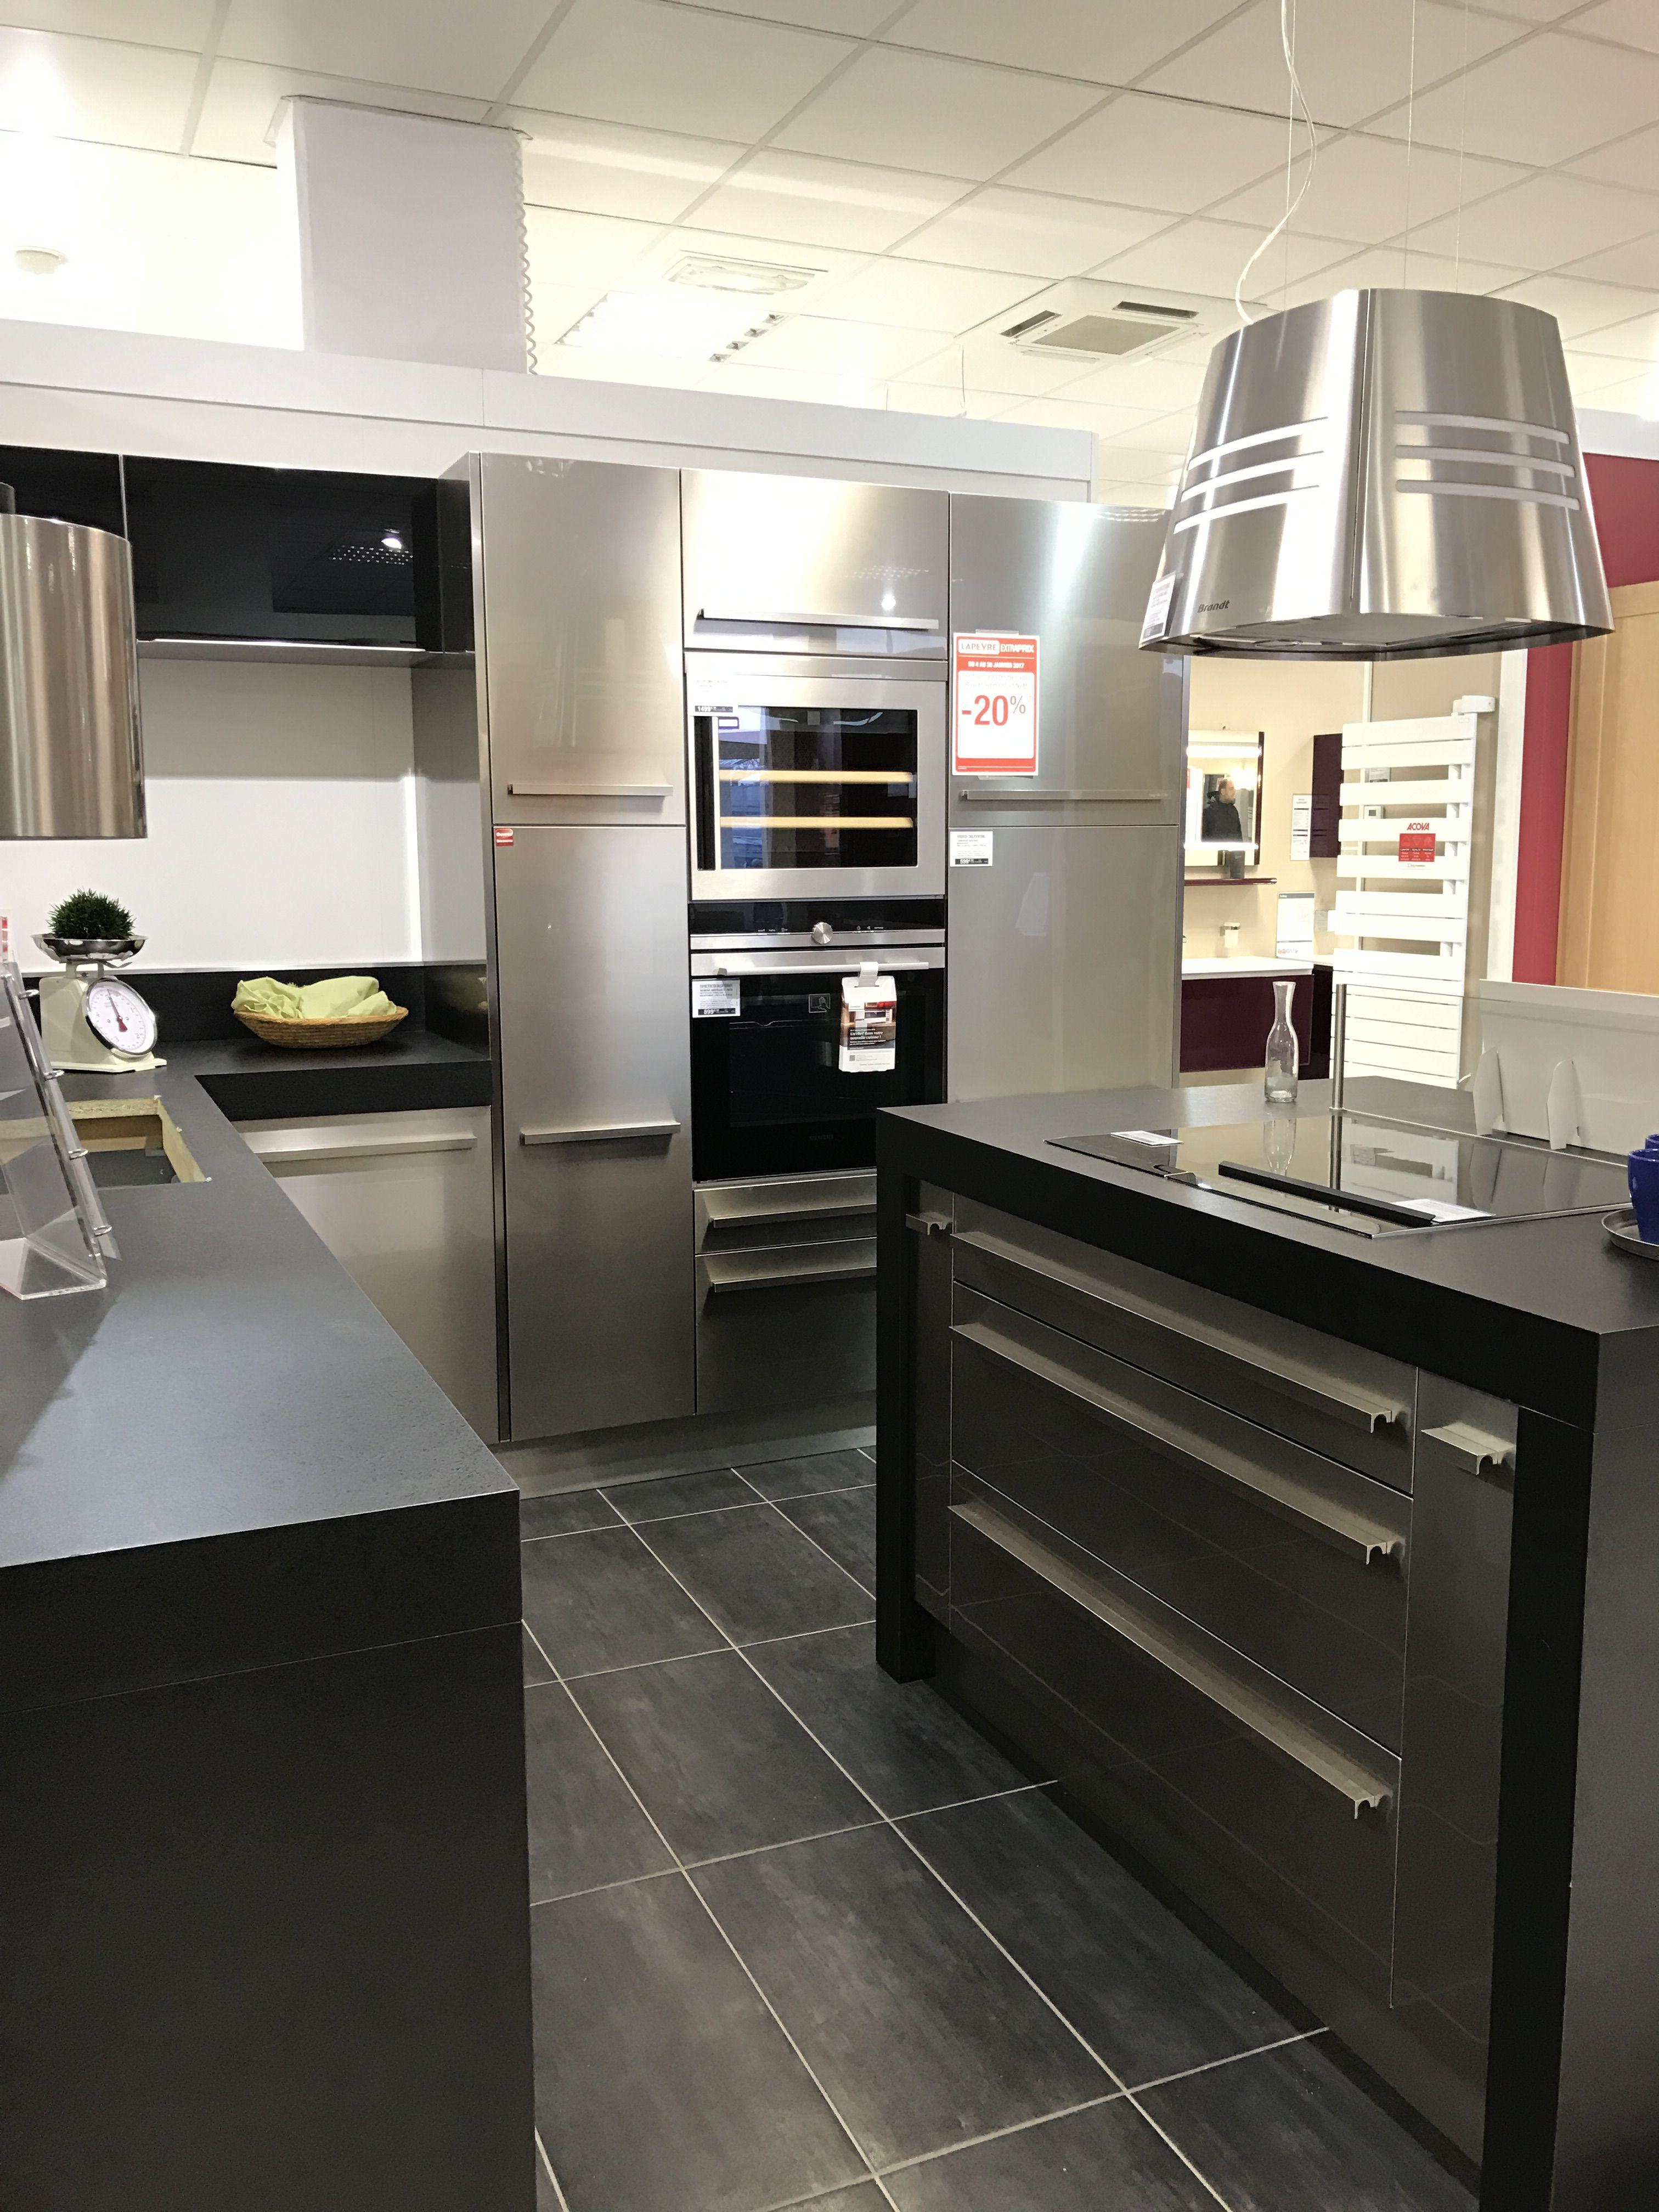 tassin cuisines stunning cours de cuisine lyon lyon cours de cuisine lyon ouest lyon cours de. Black Bedroom Furniture Sets. Home Design Ideas